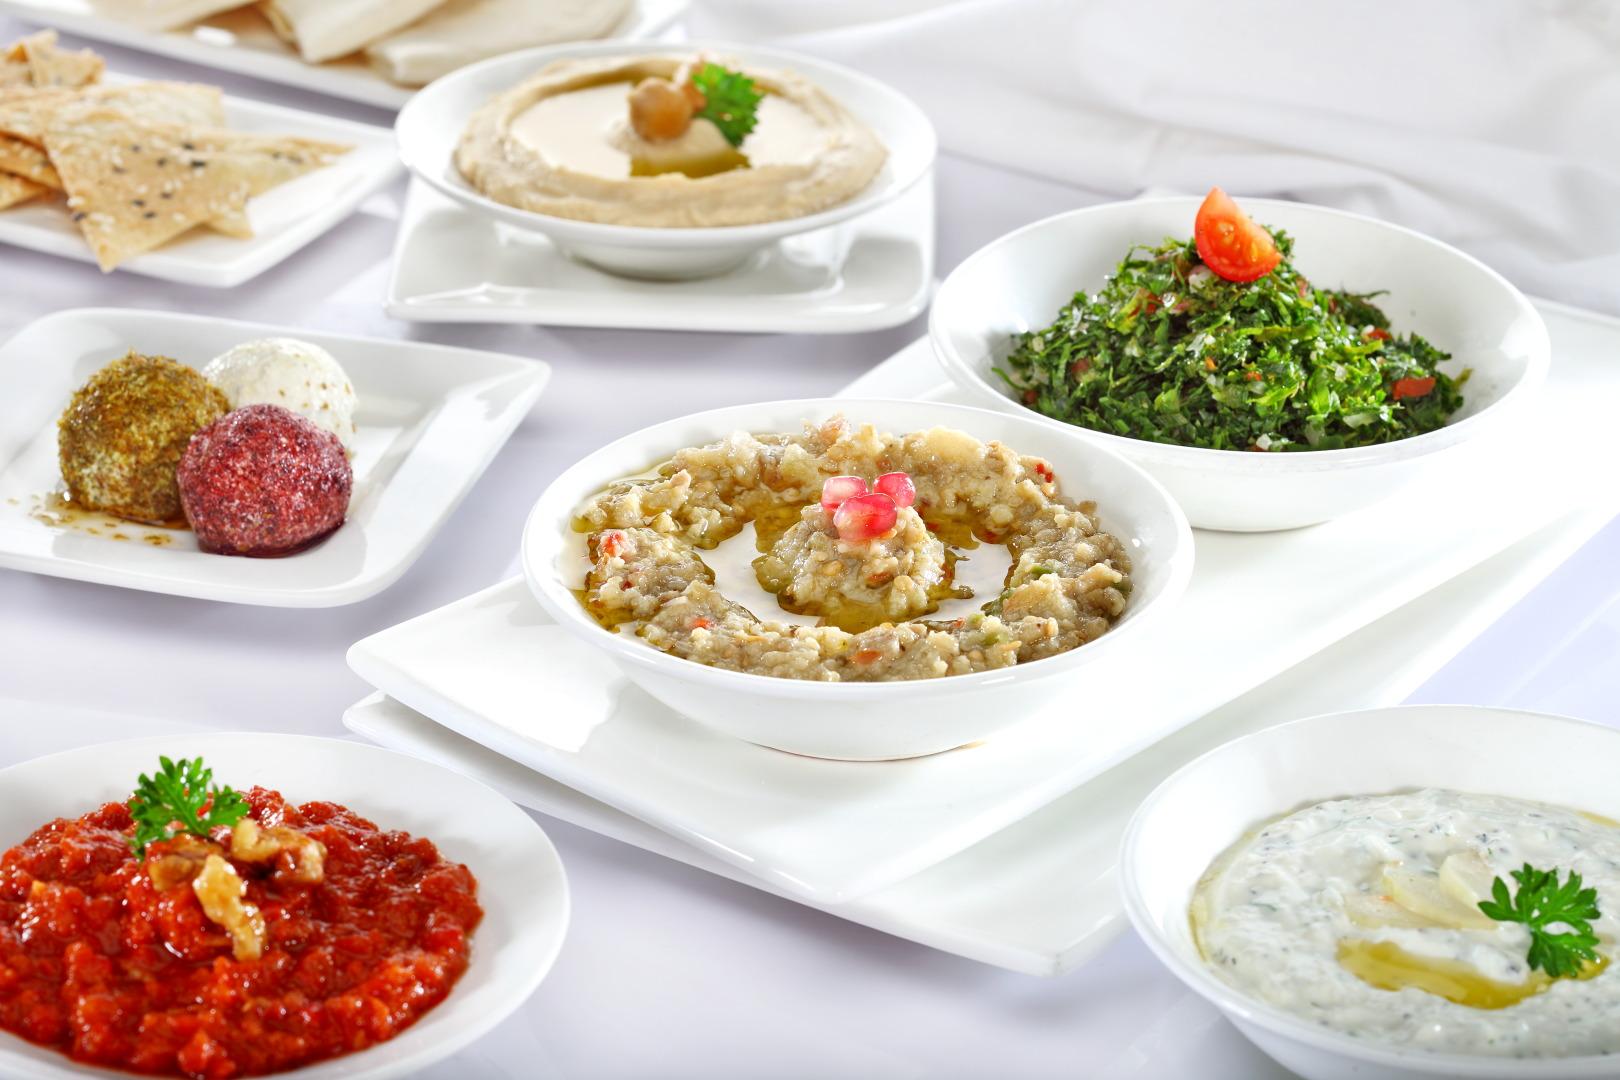 Mezze Platter at Aqaba